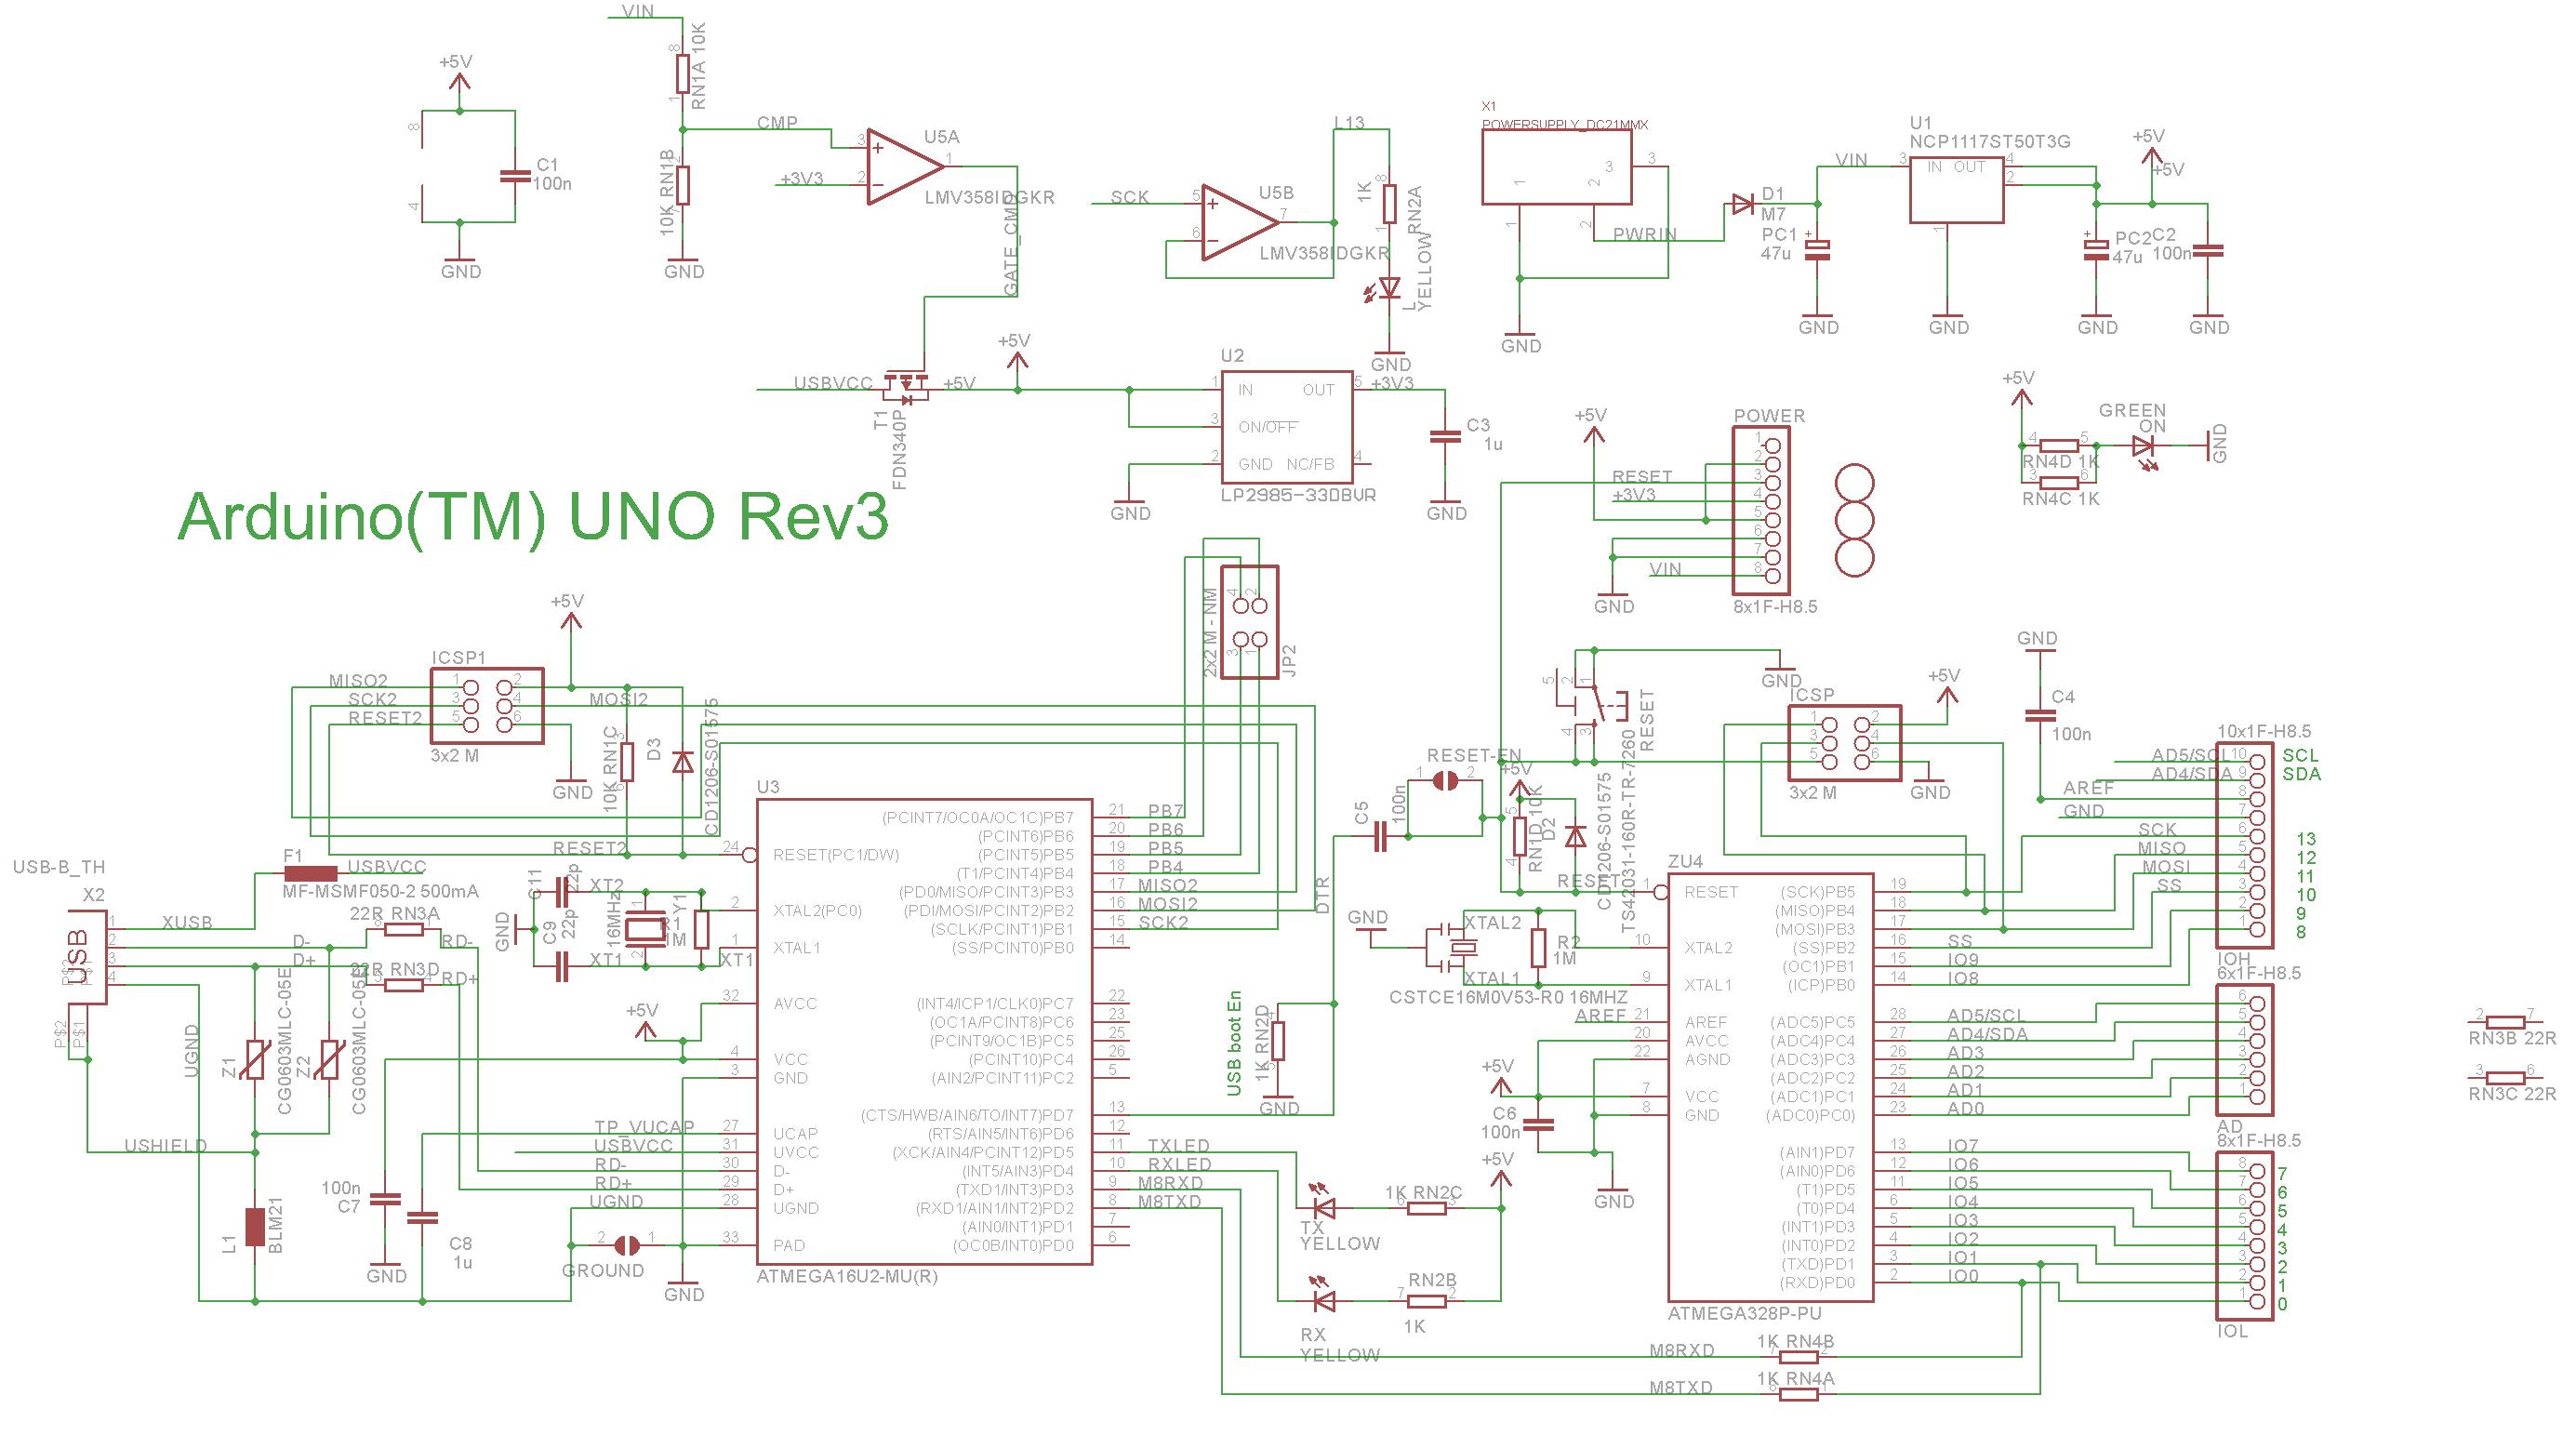 arduino mega 2560 circuit diagram single pole light switch introduction to uno uses avr atmega328